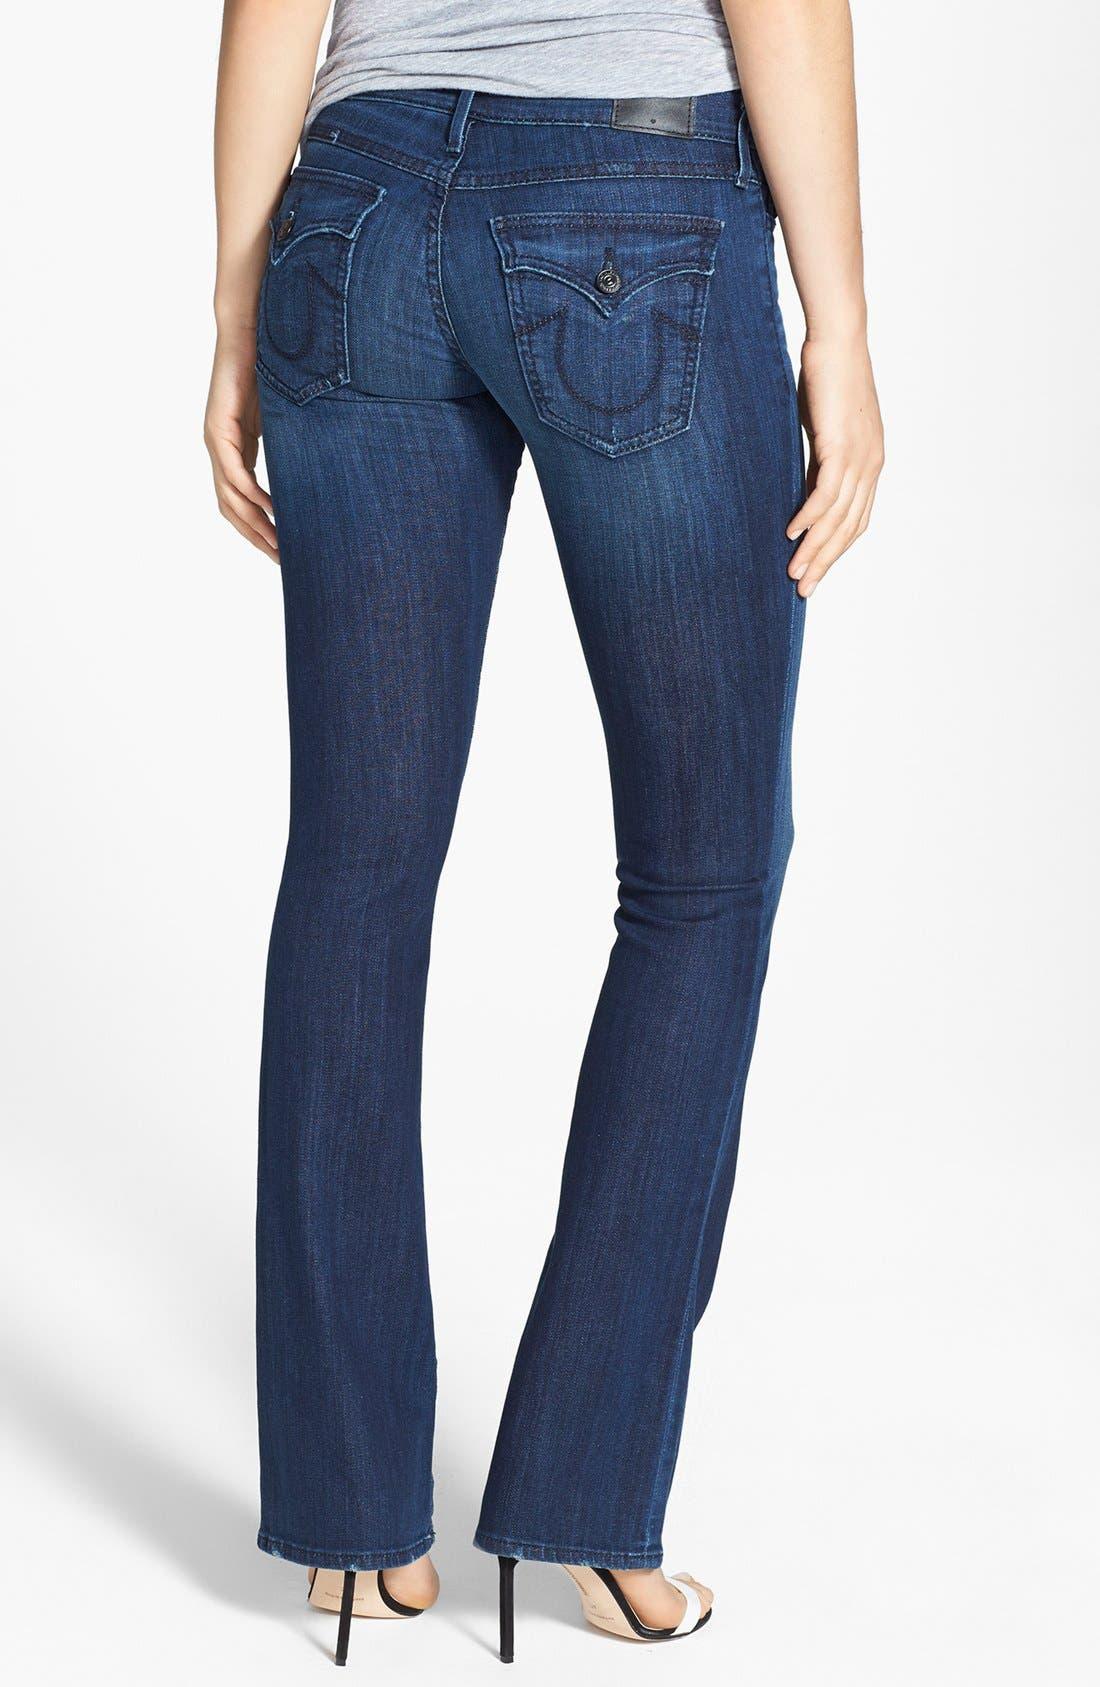 Alternate Image 2  - True Religion Brand Jeans 'Becca' Bootcut Jeans (Faithful Message)